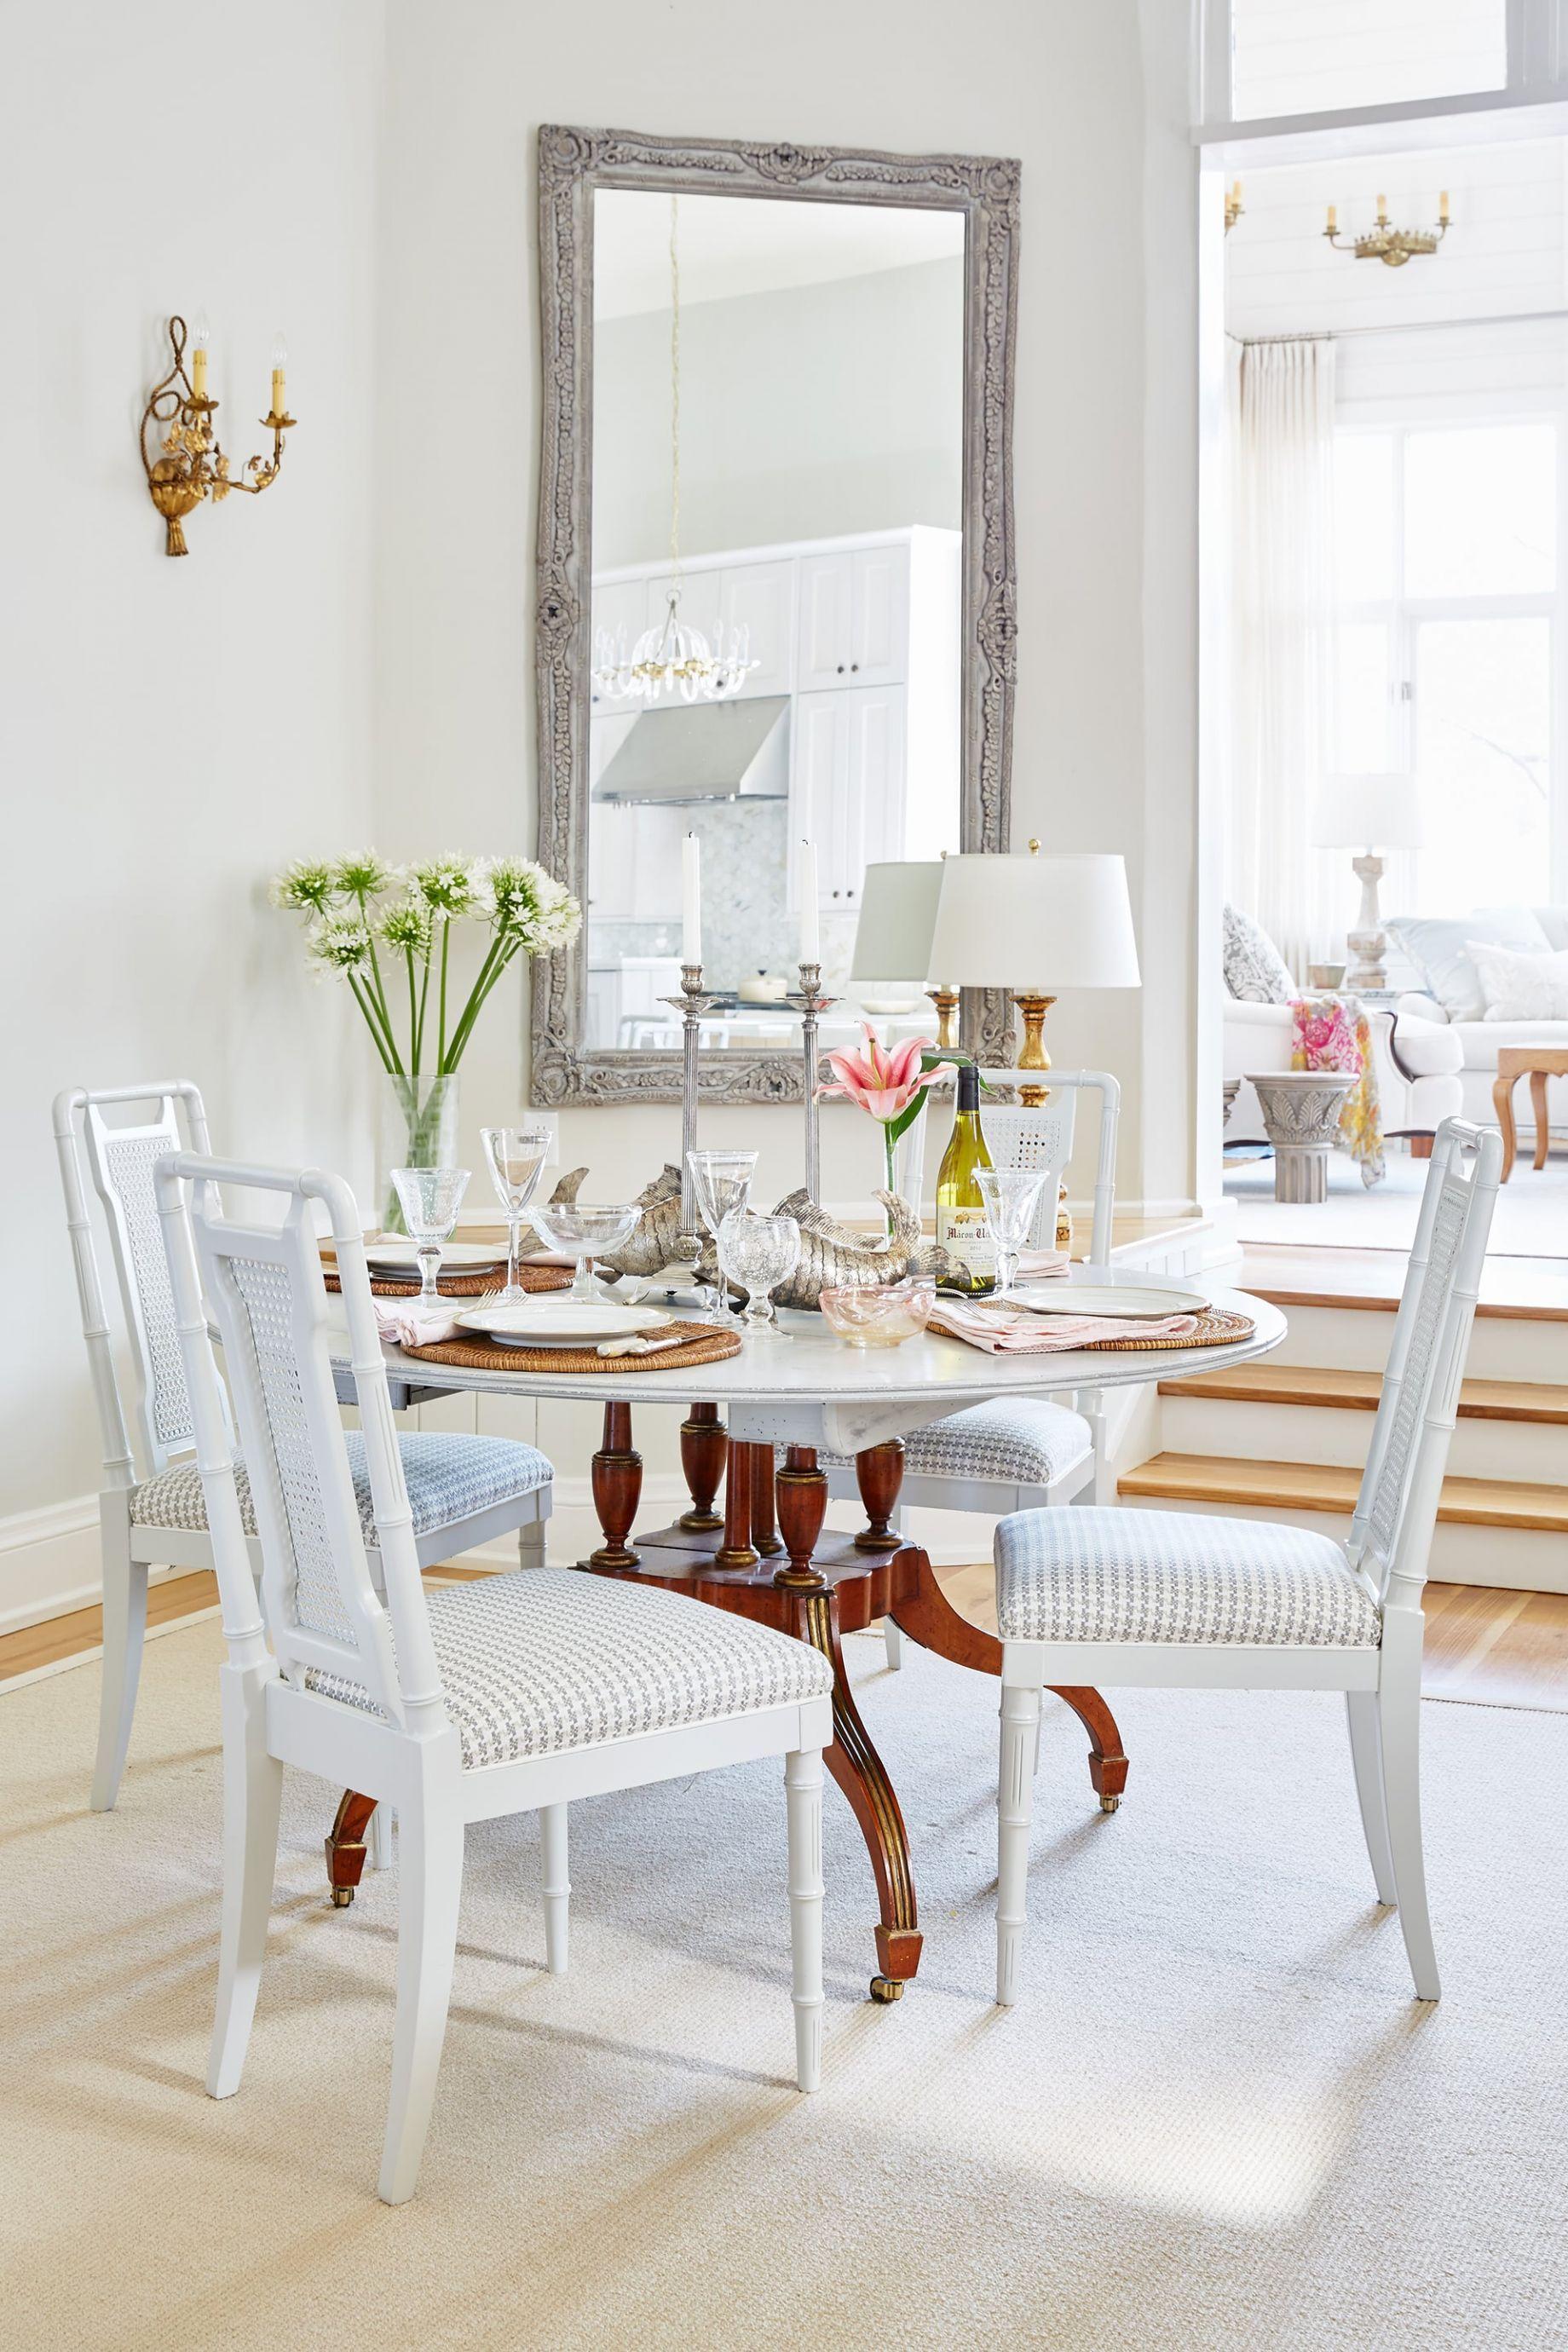 Glenlily Country House обеденный стол Дизайн, Стол